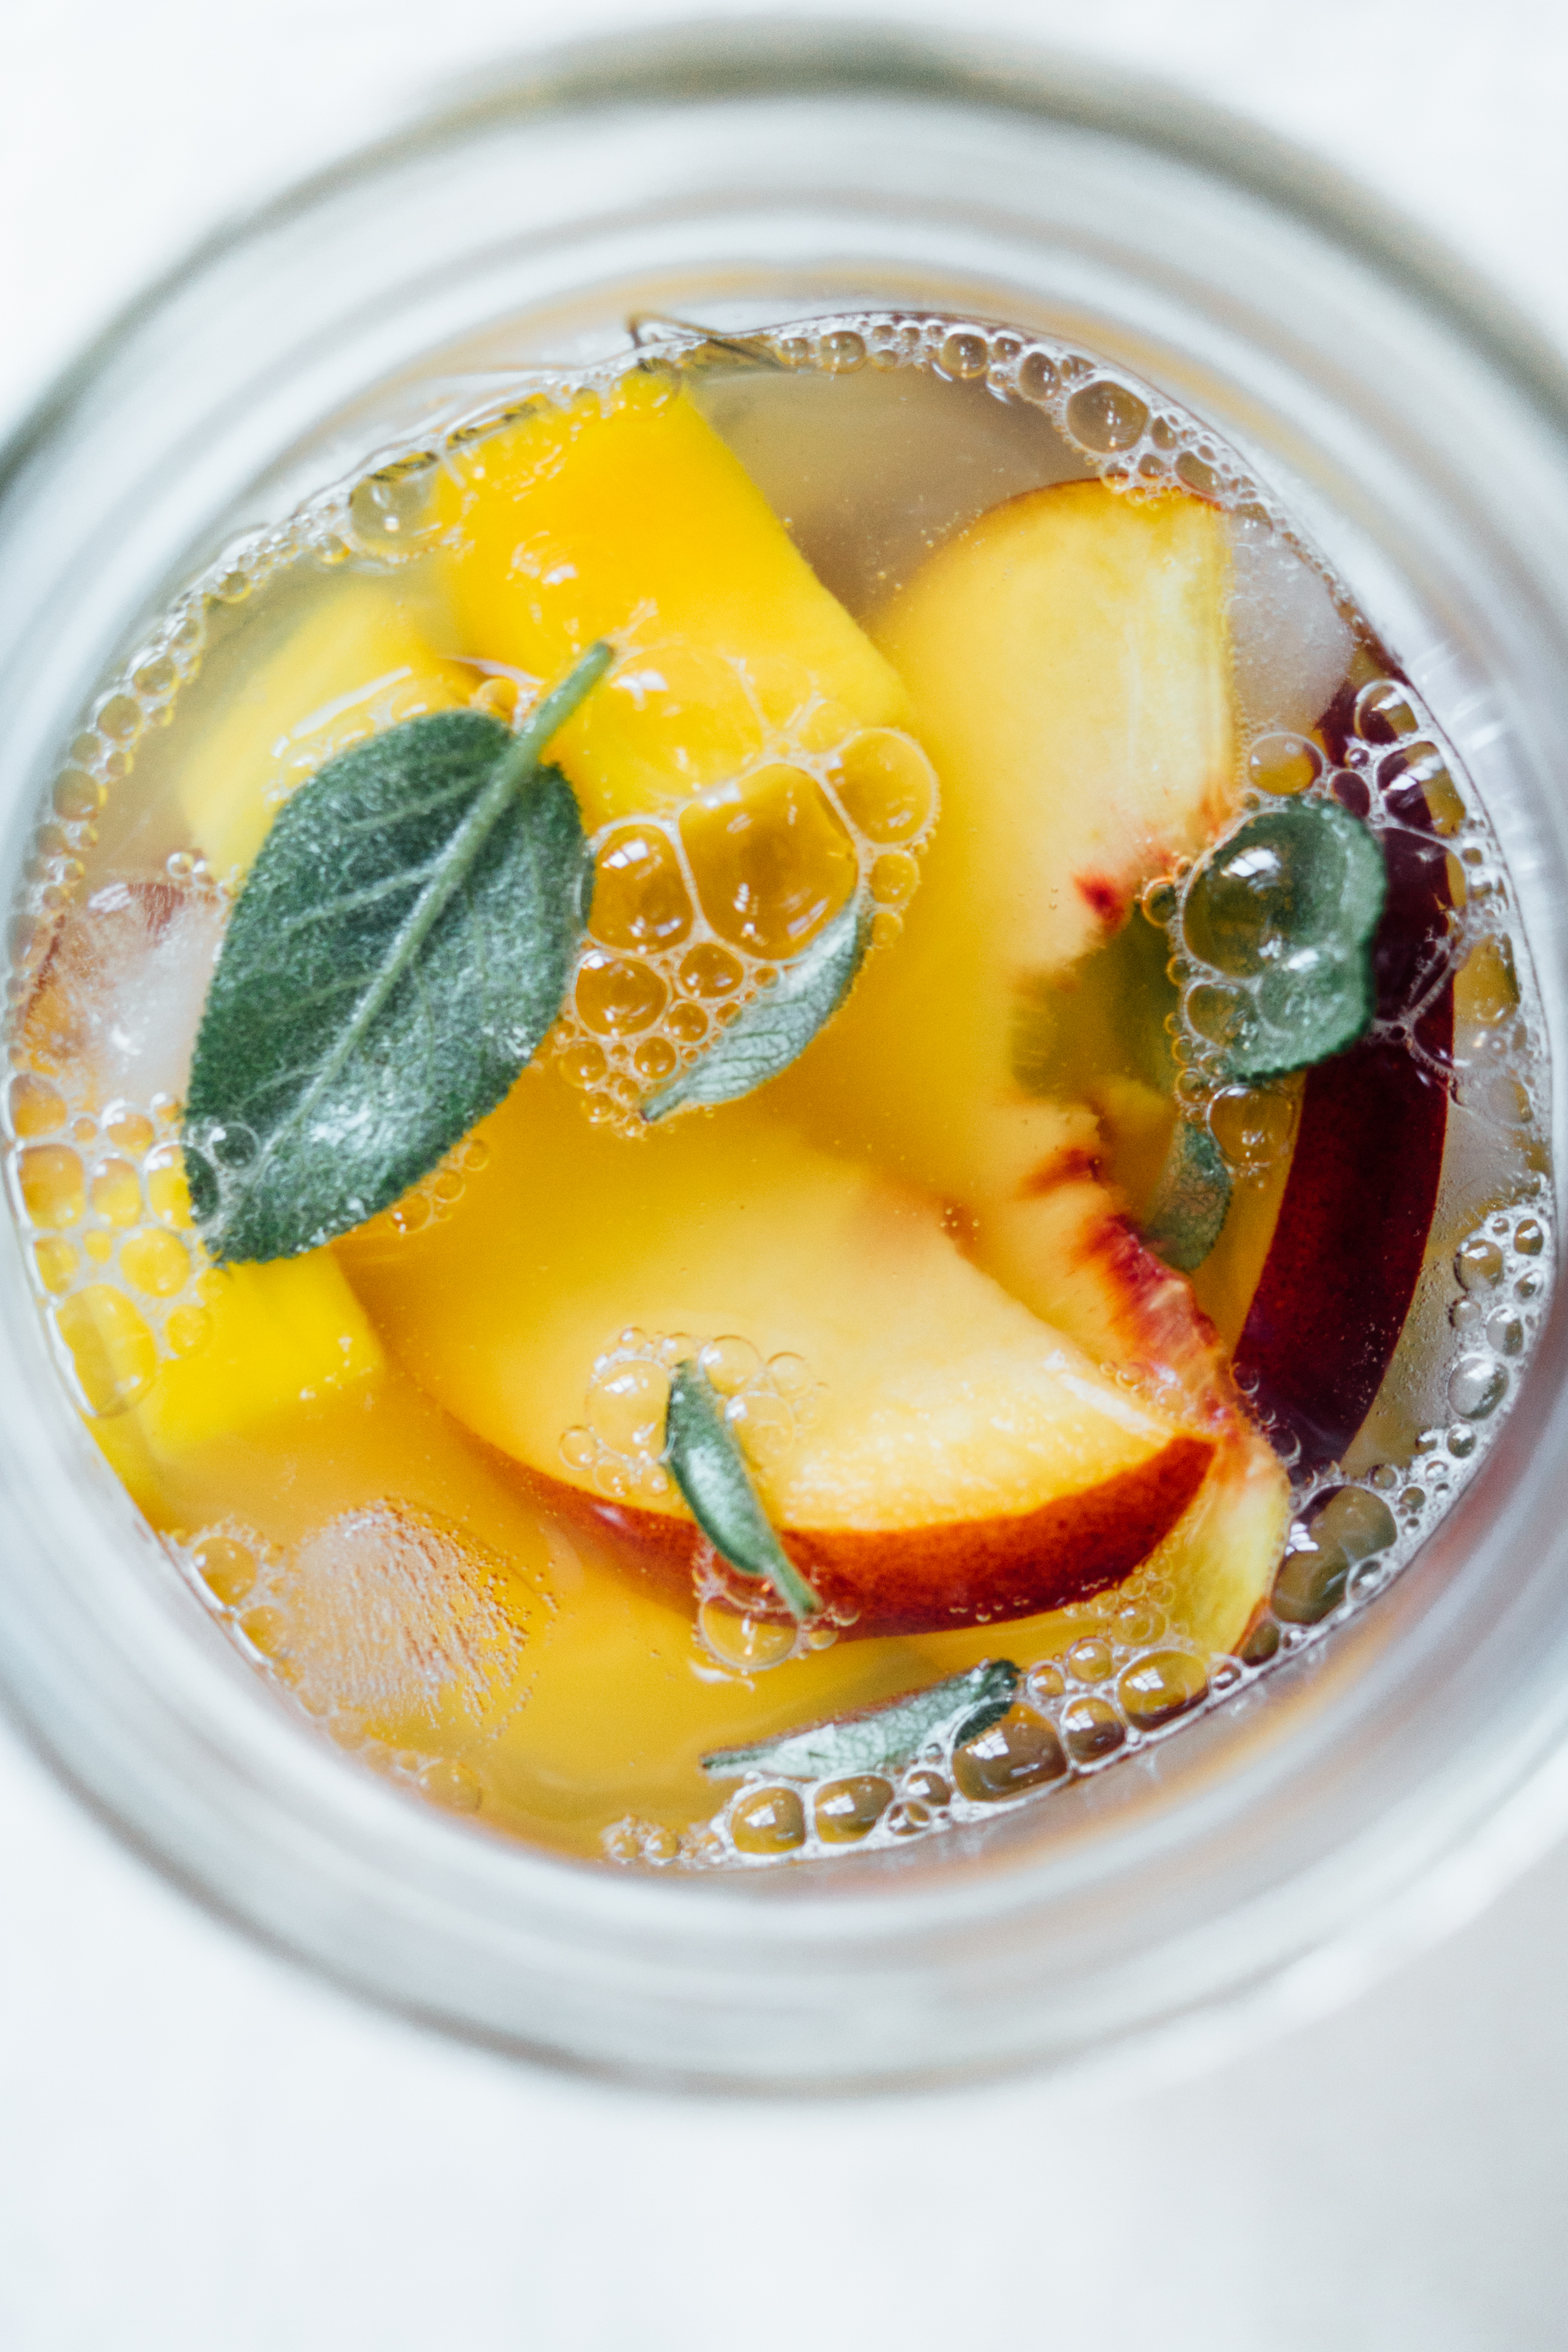 Peach Mango and Sage Lemonade | TENDING the TABLE